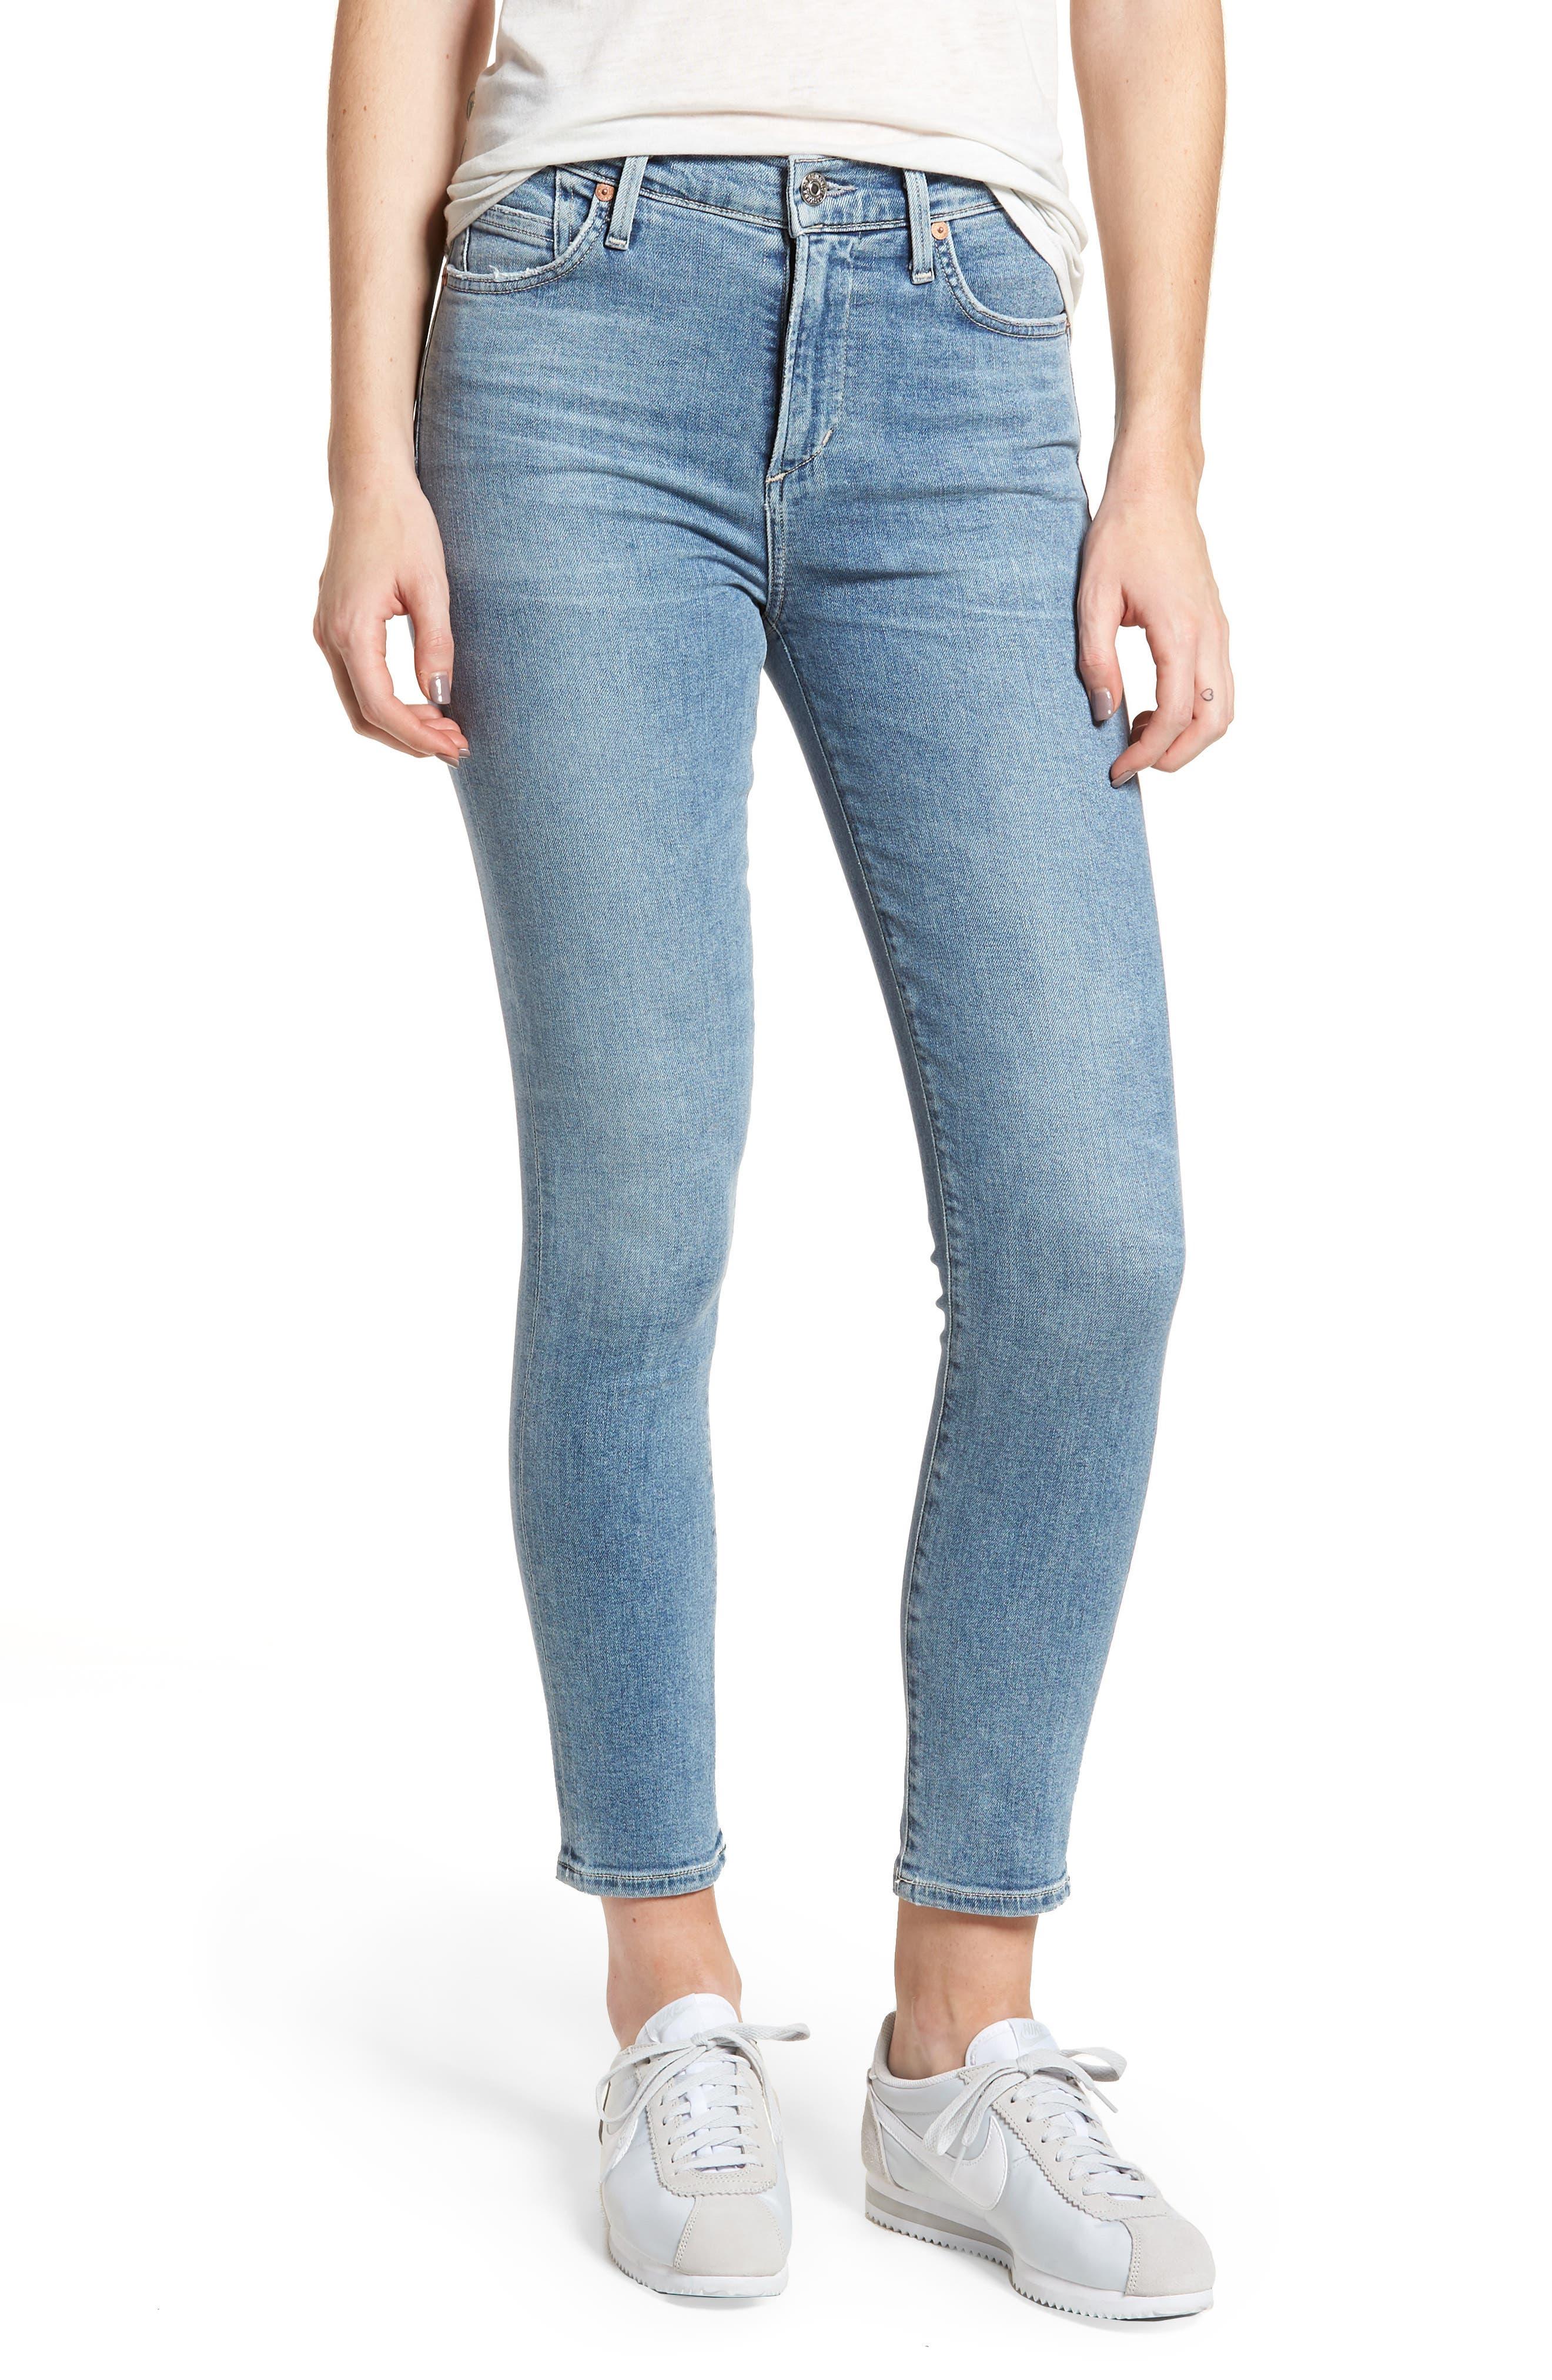 Rocket High Waist Crop Skinny Jeans,                             Main thumbnail 1, color,                             Firestone